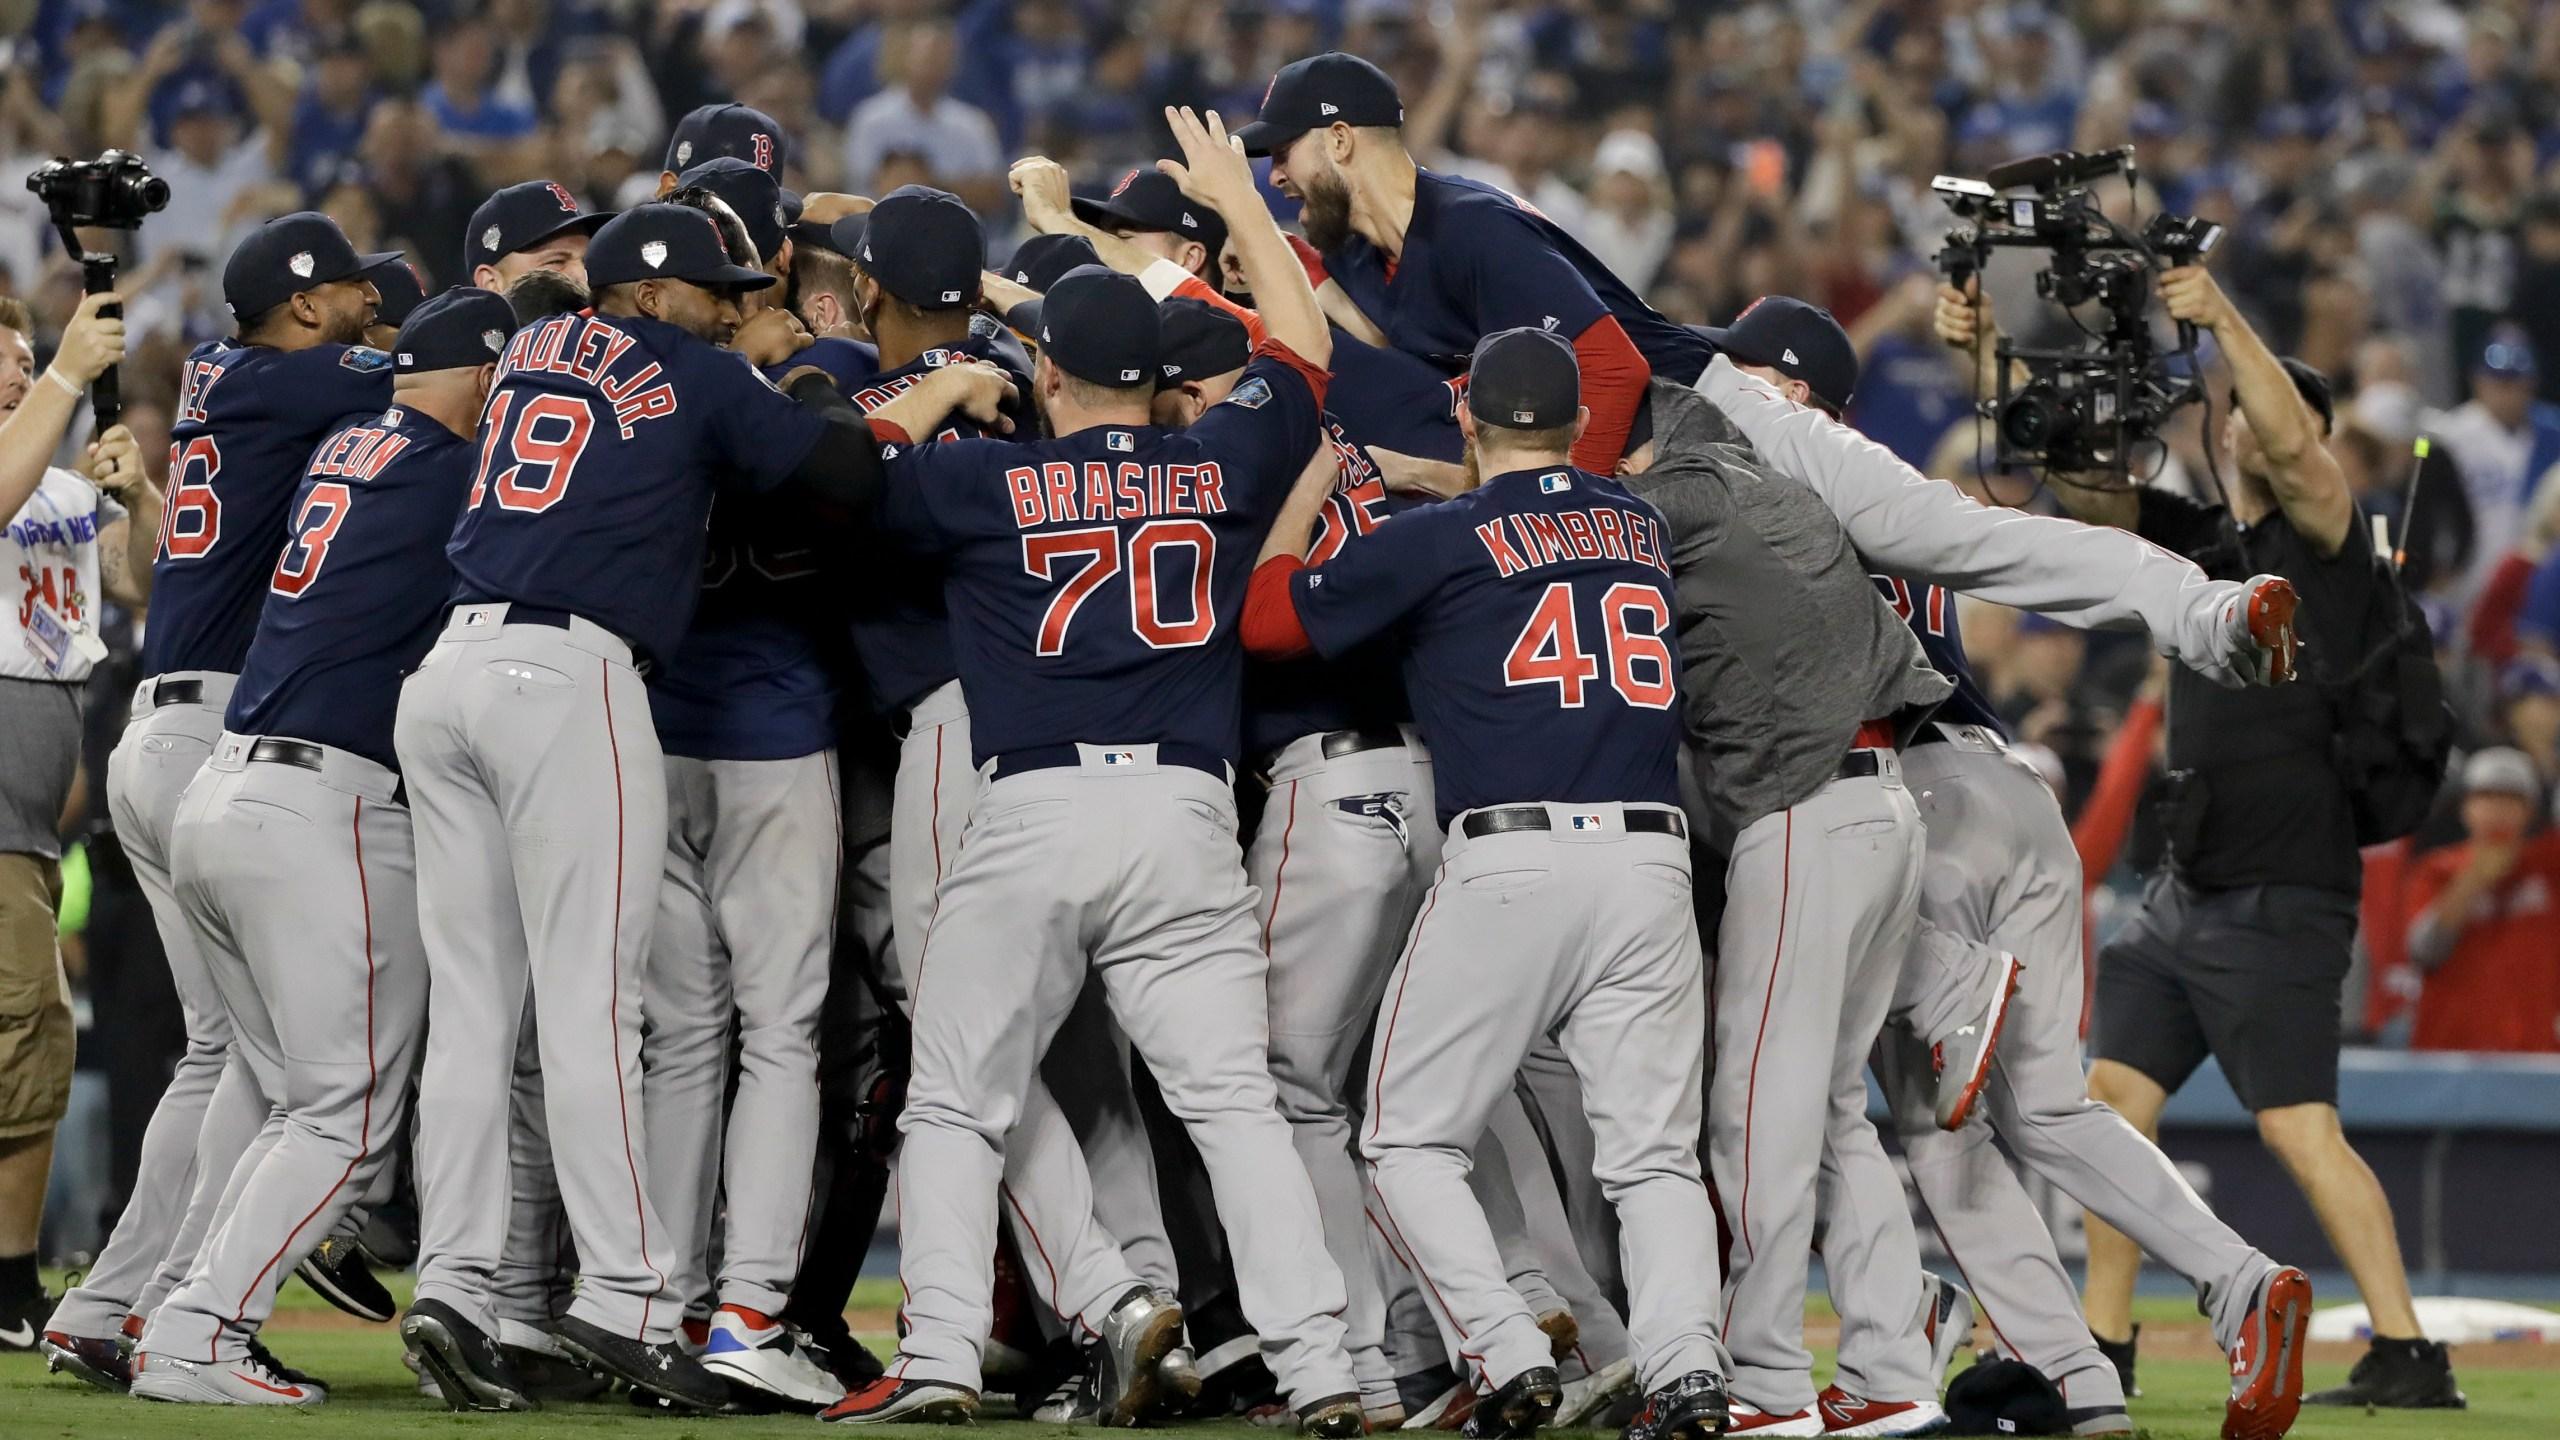 World_Series_Red_Sox_Dodgers_Baseball_94543-159532.jpg87383412